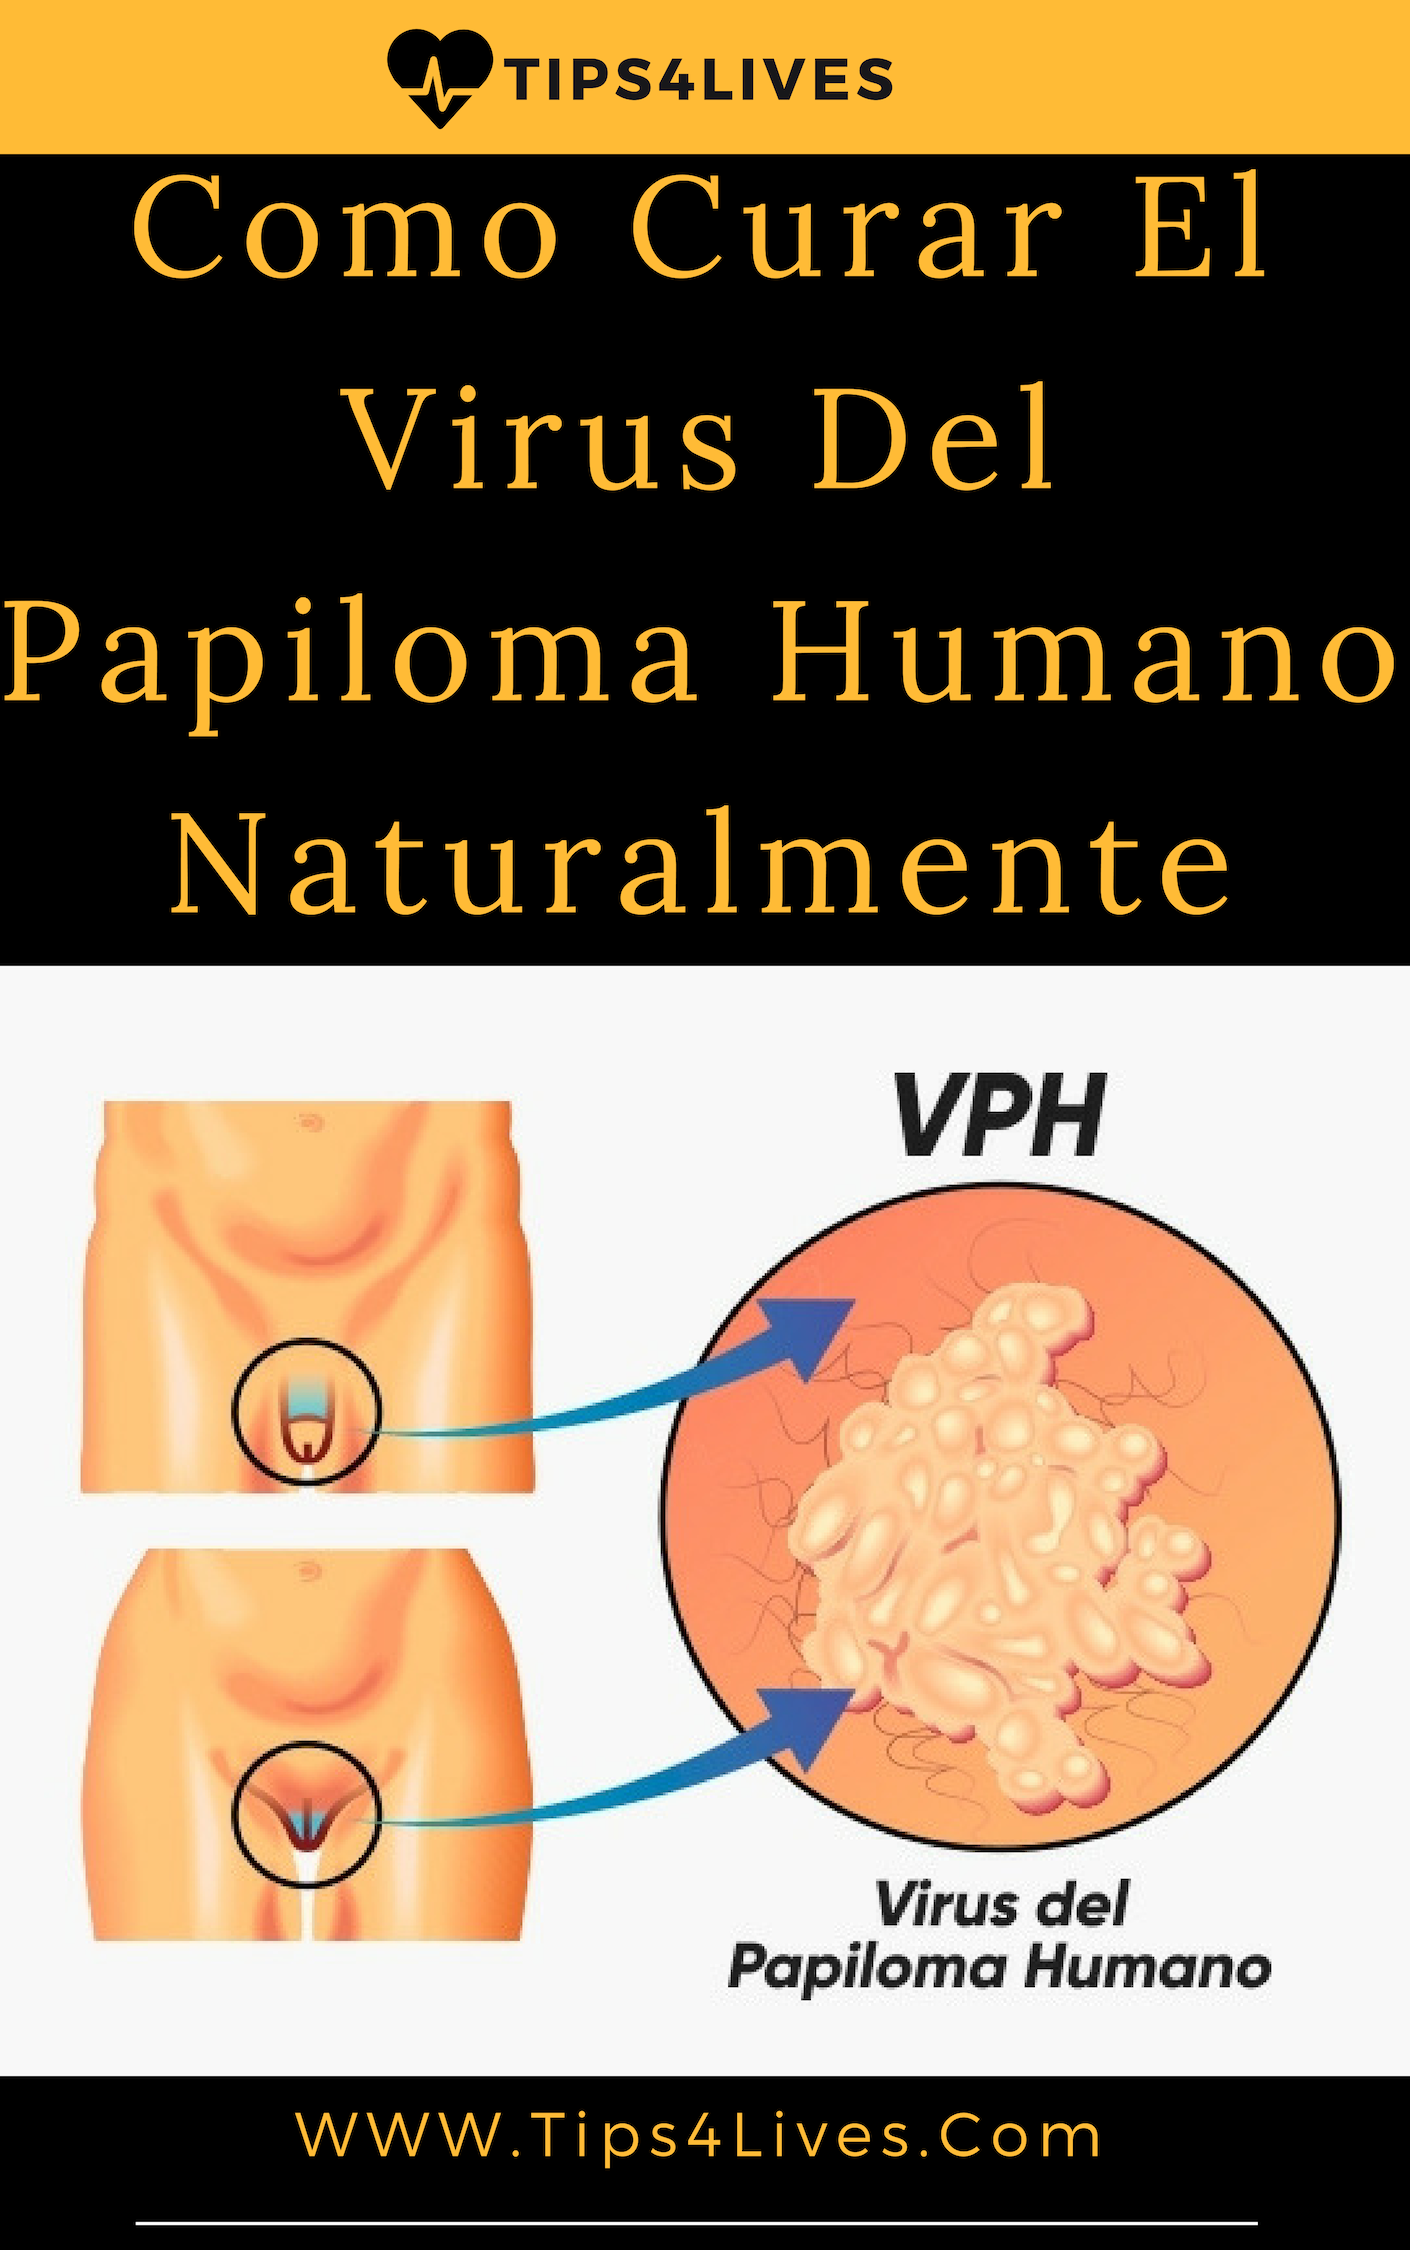 papilomavirus en hombres tratamiento